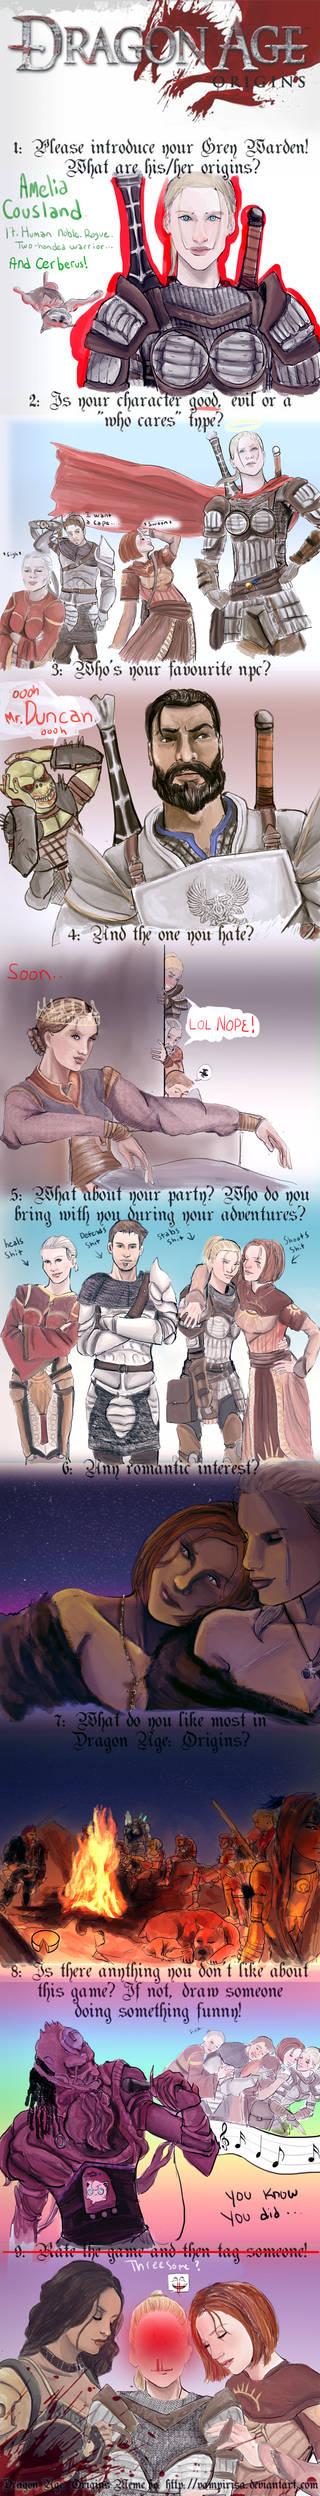 Dragon Age Origins Meme